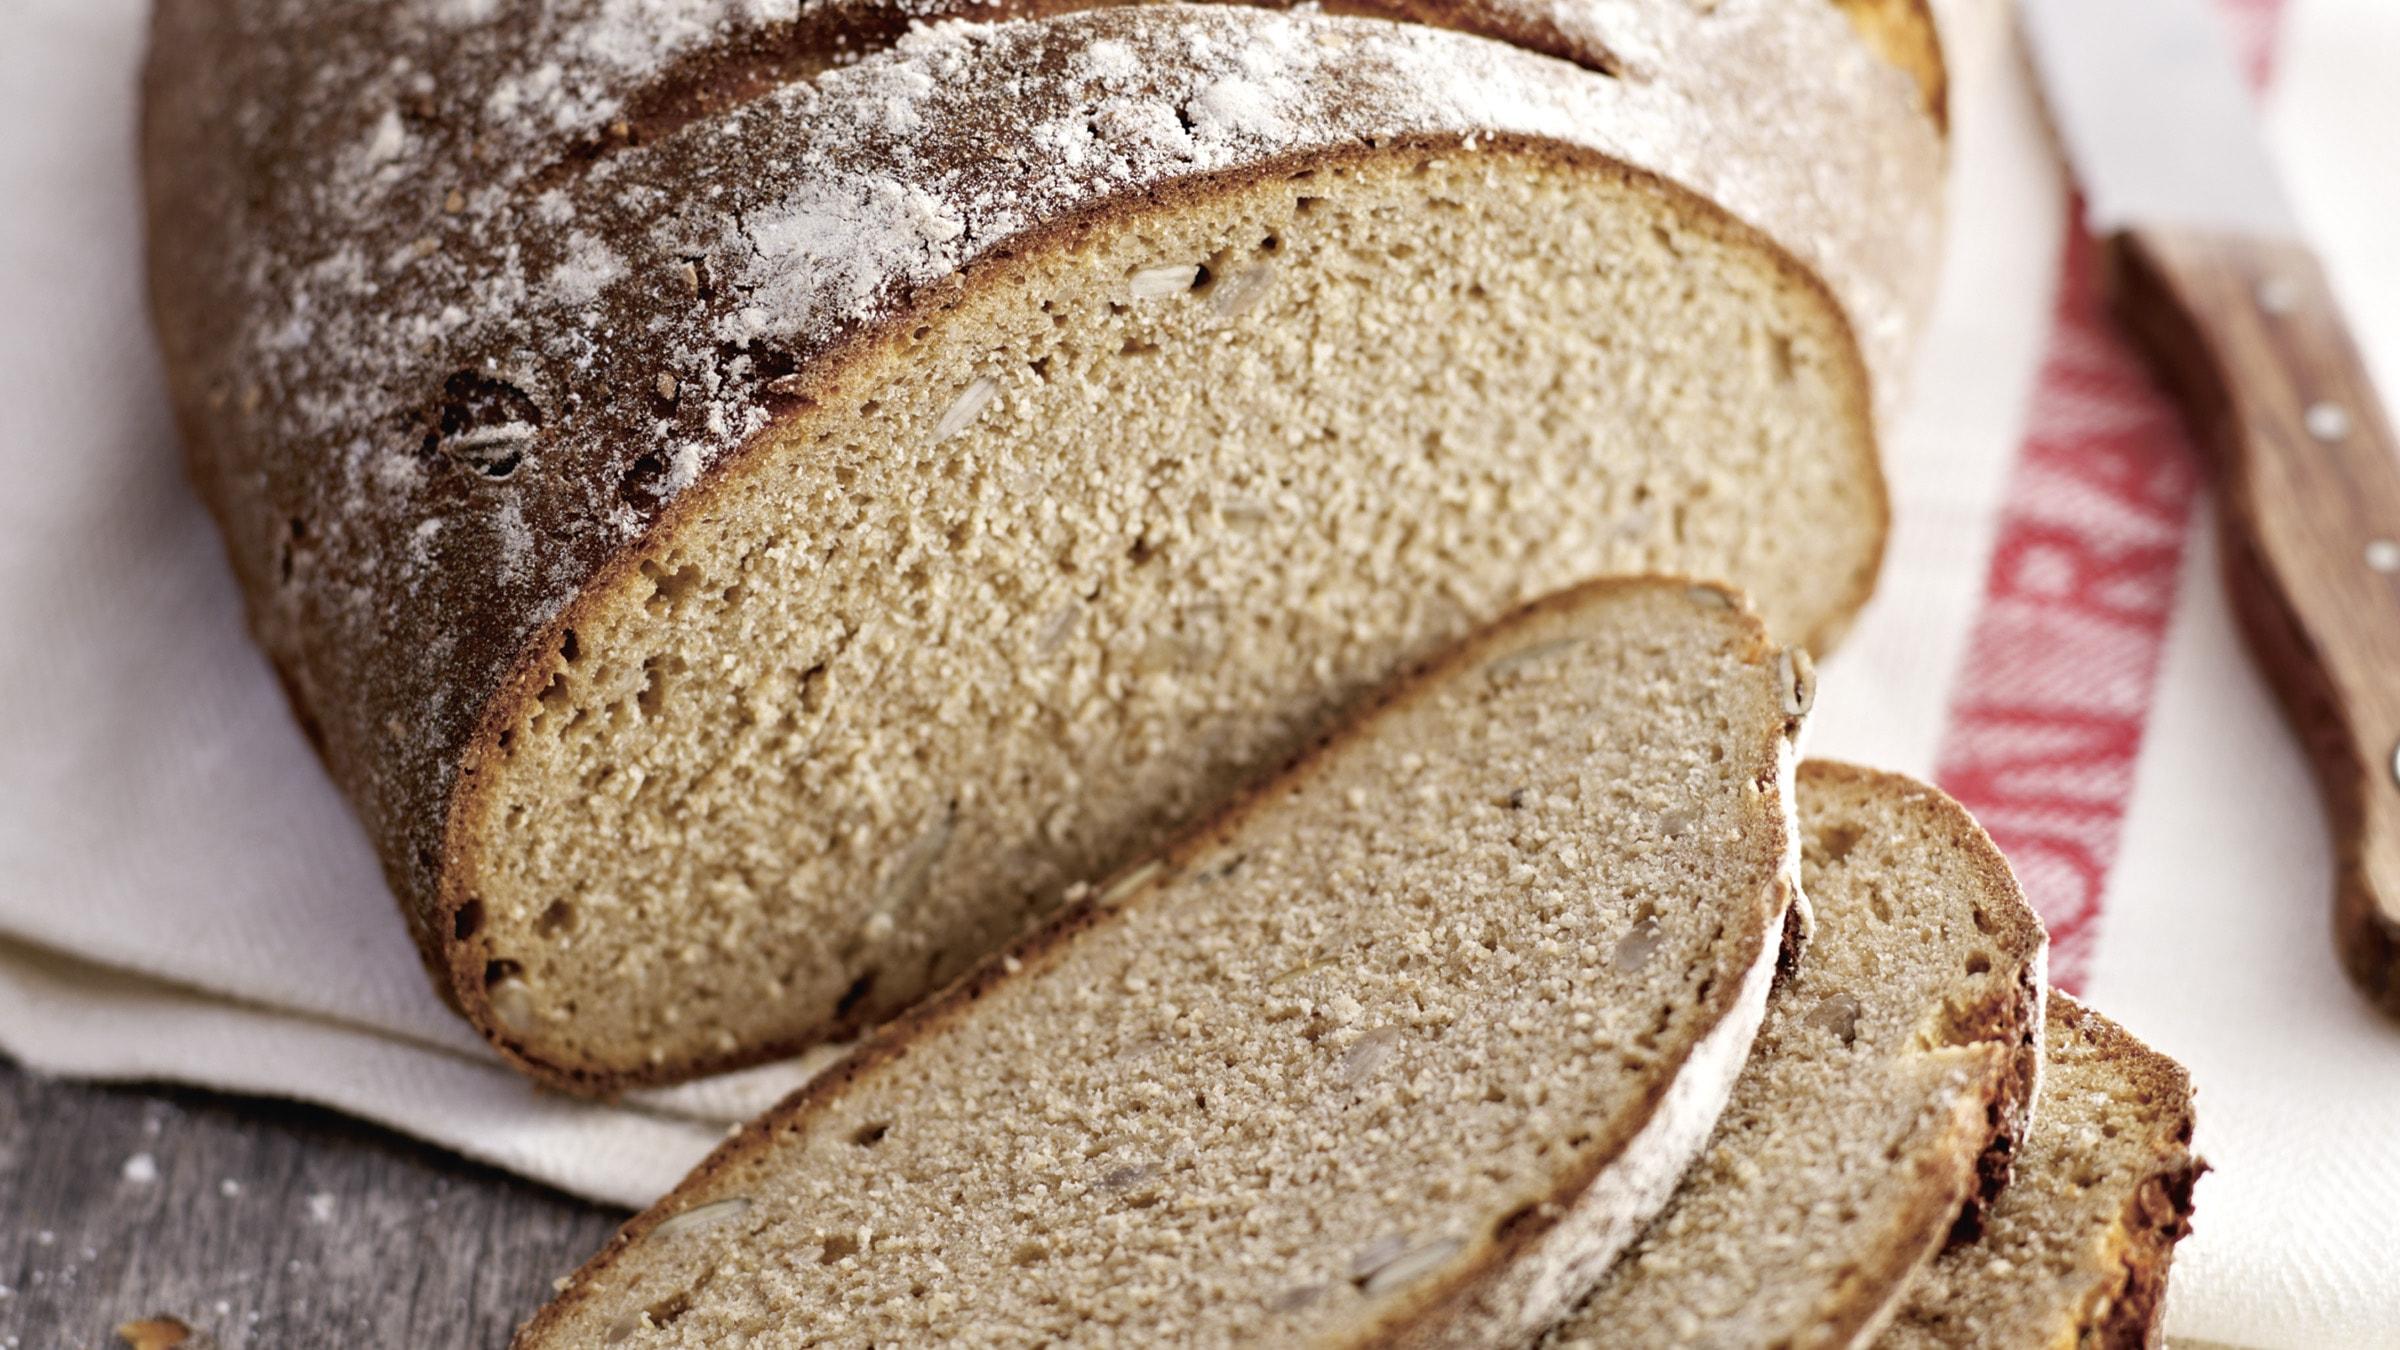 Brot selber backen - Anleitung, Tipps und Rezepte